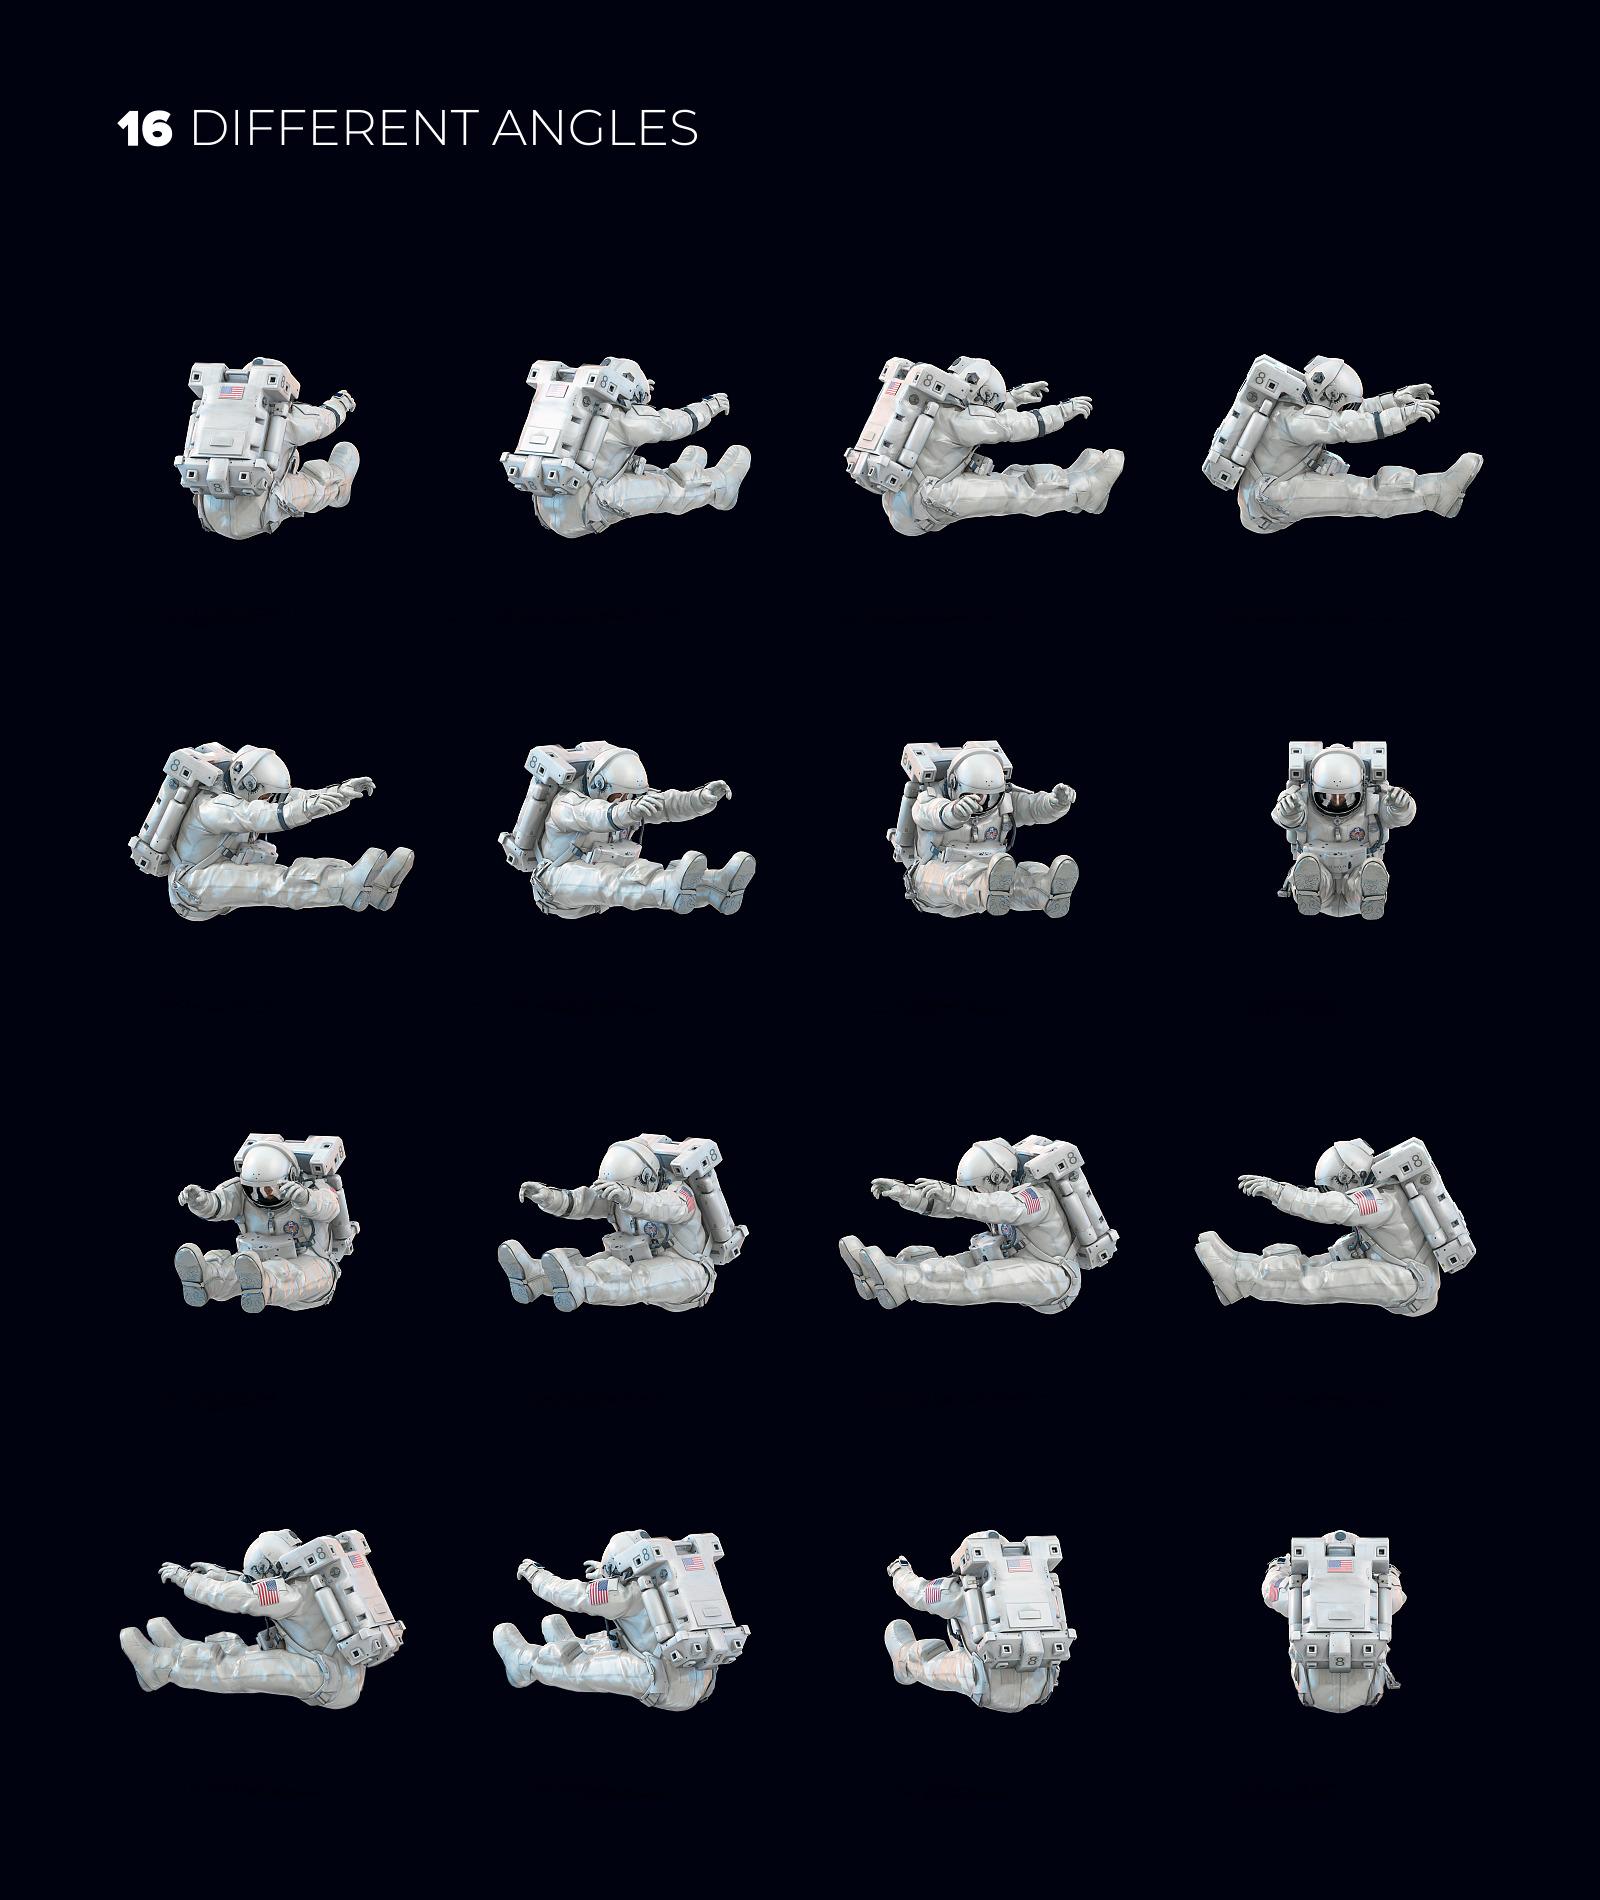 3D Mockup Space Astronaut #17